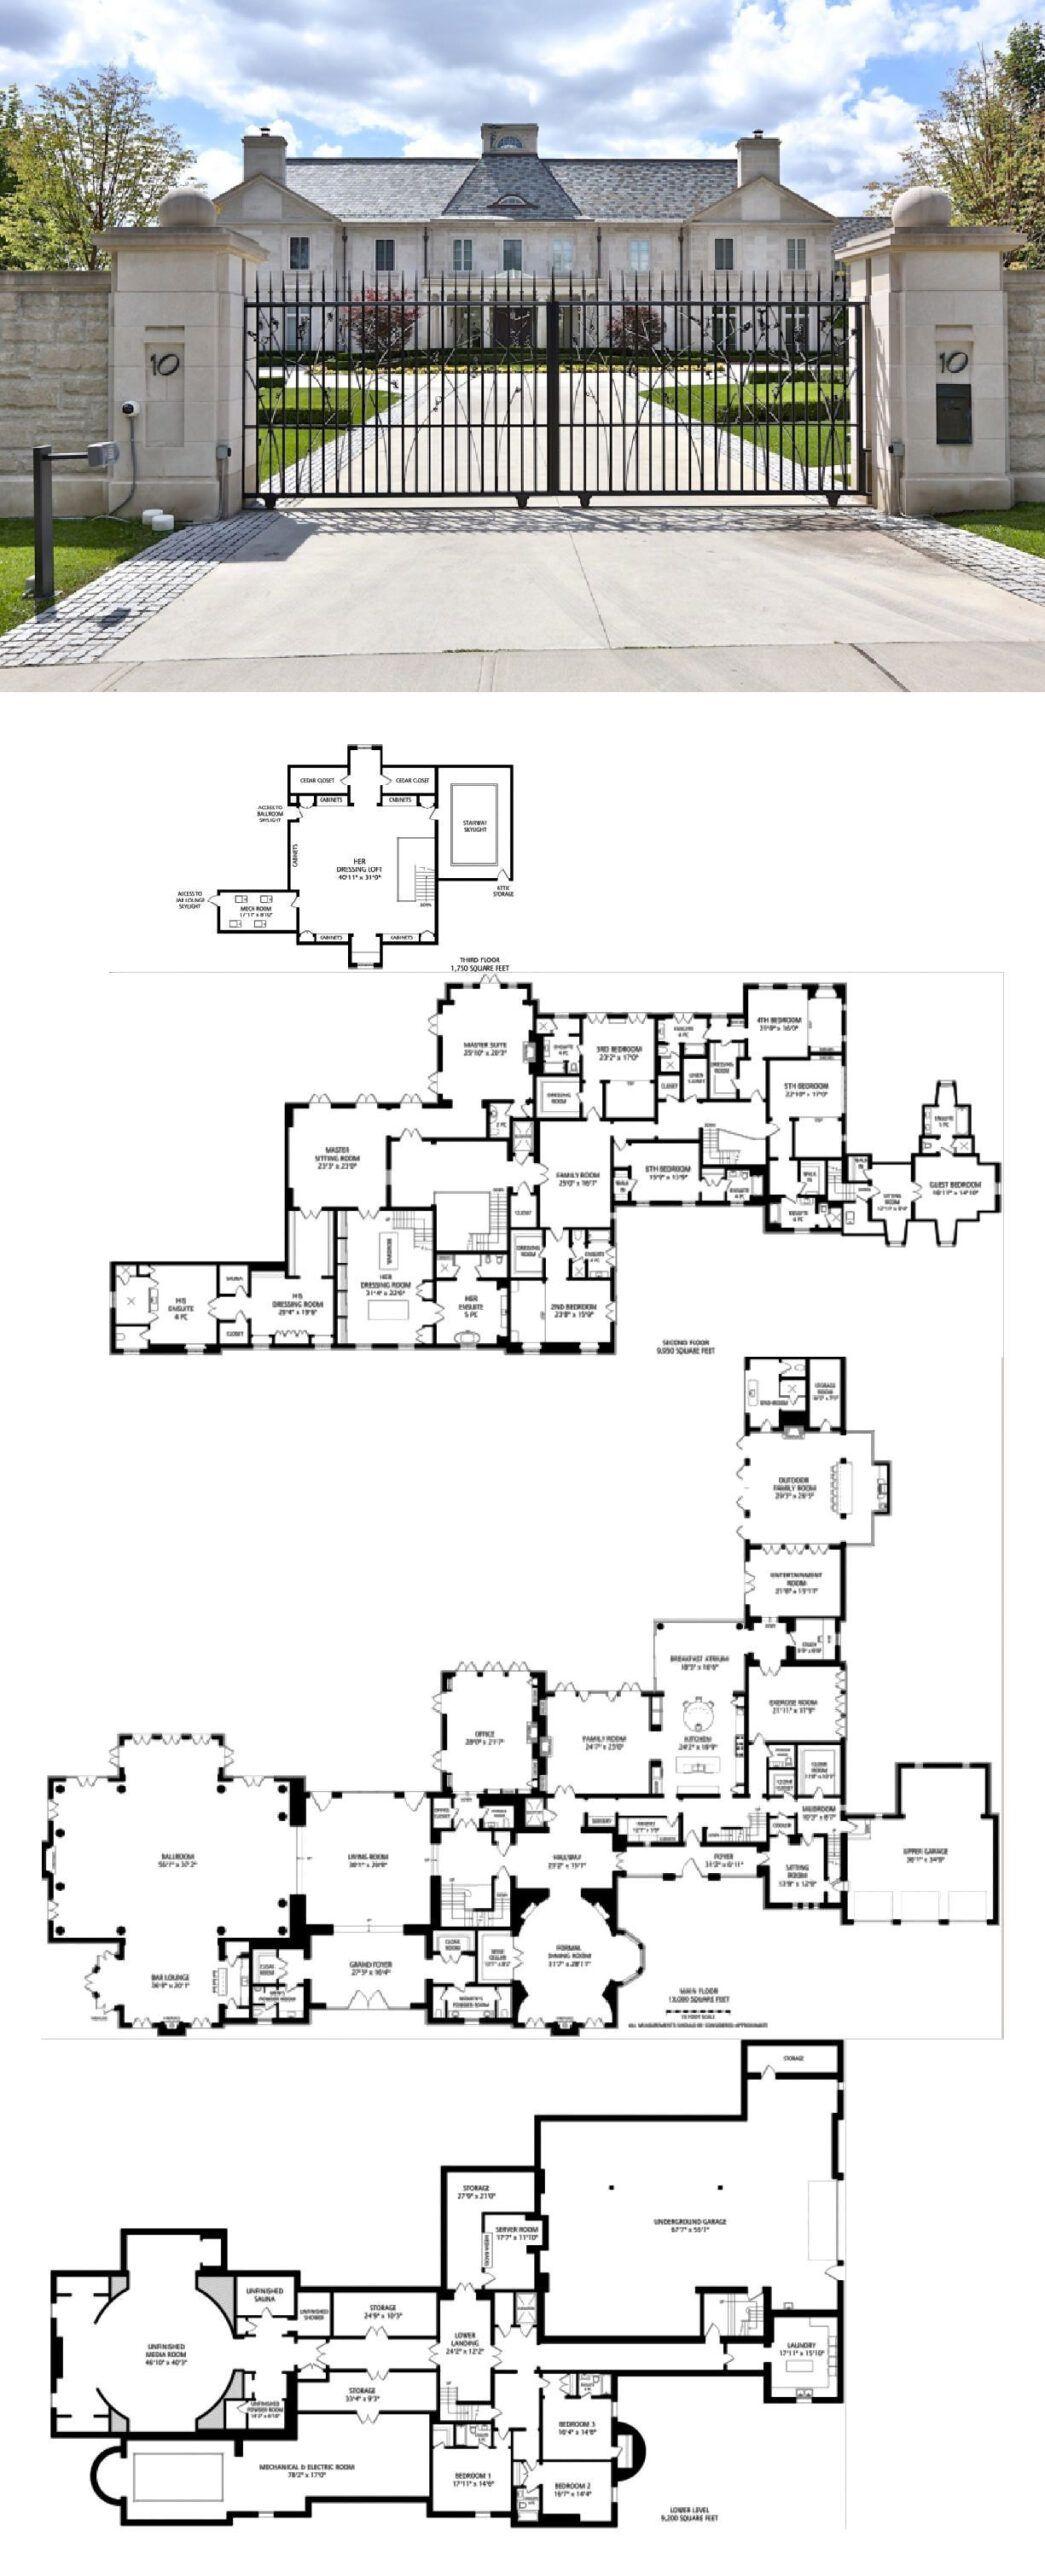 Mansion House Plans House Plans Mansion Mansion Floor Plan Mansion Plans